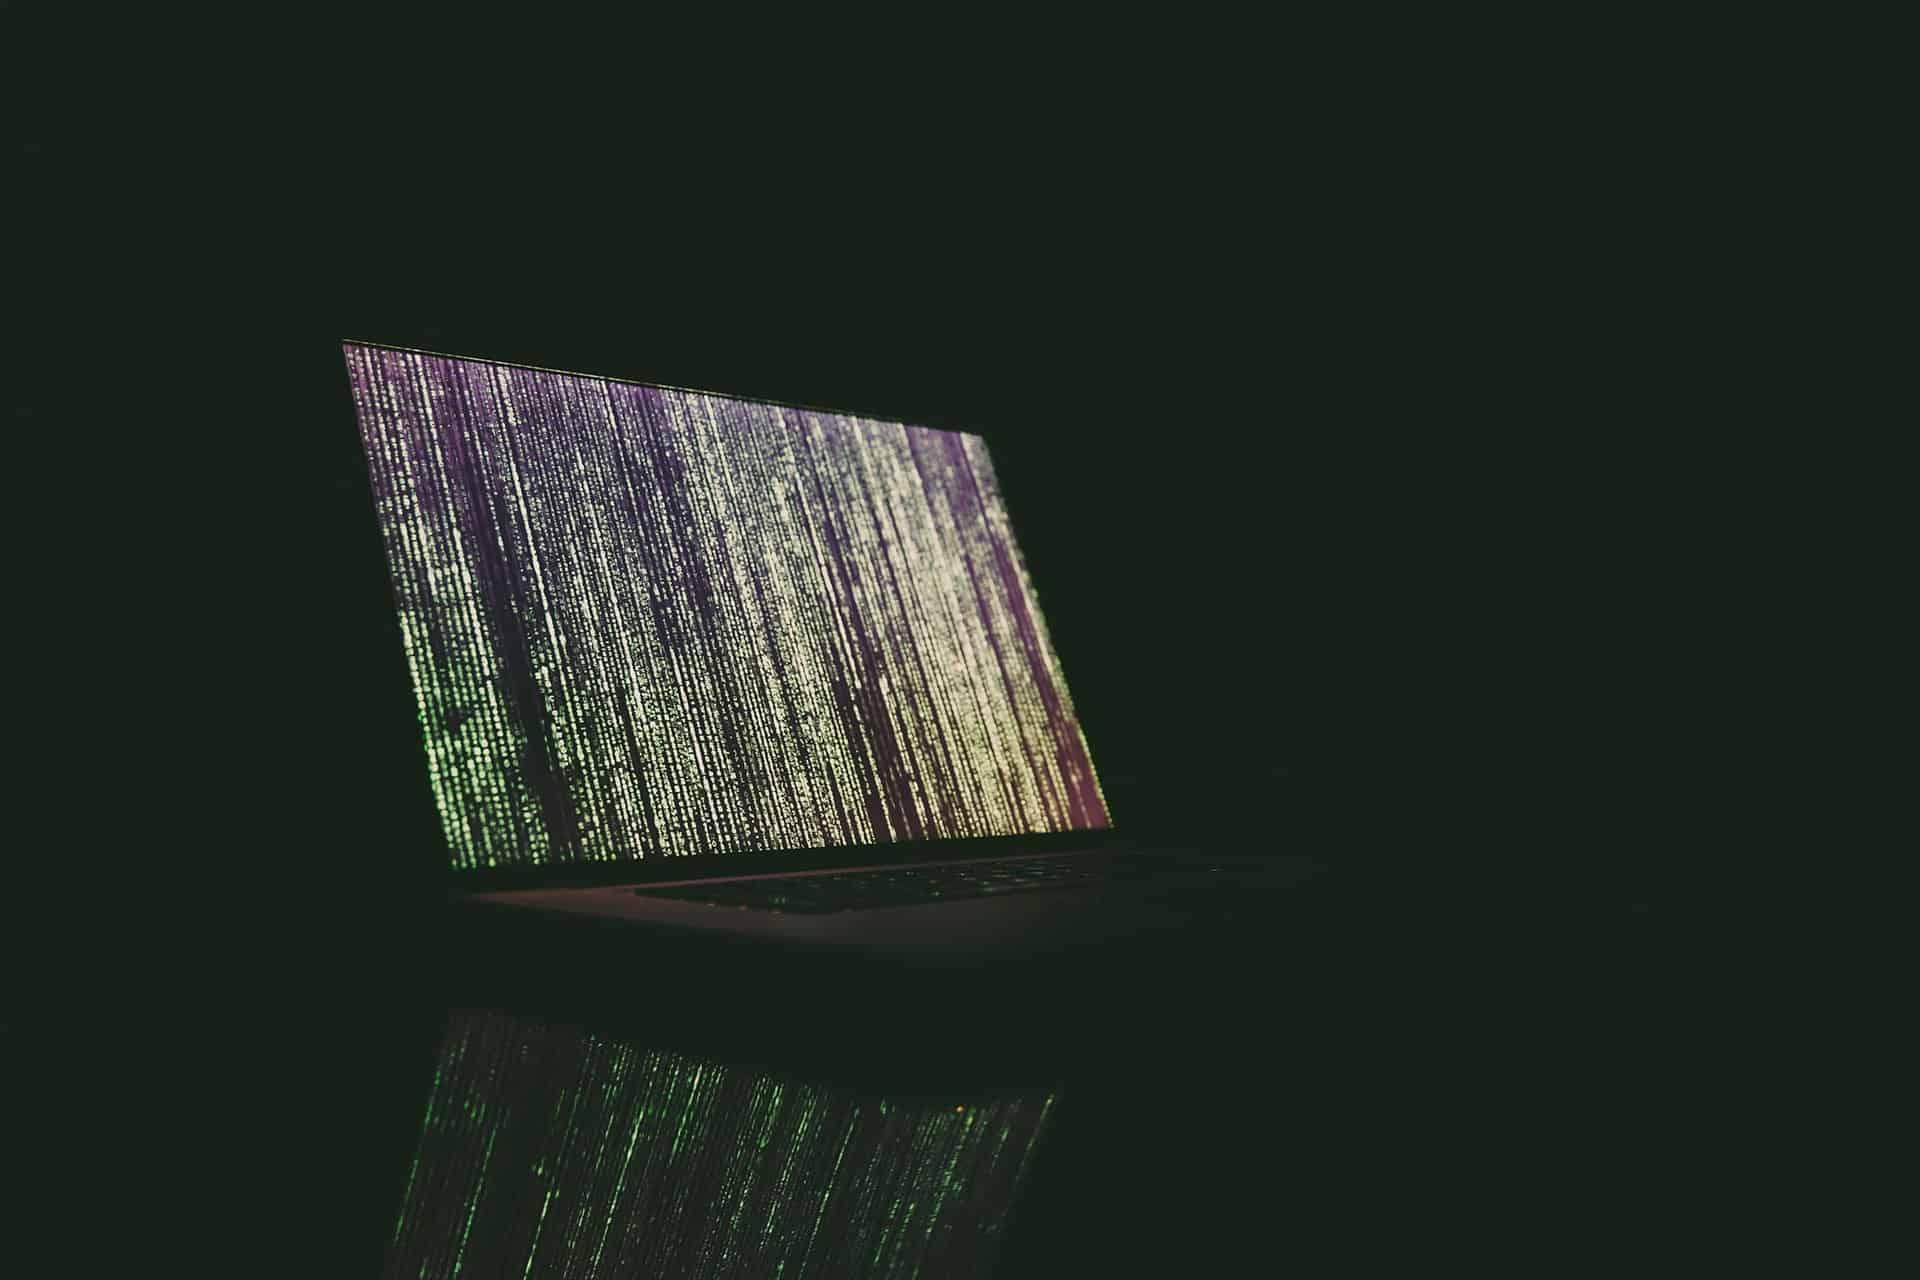 Sistemi Operativi ed Infrastruttura - Nexsys